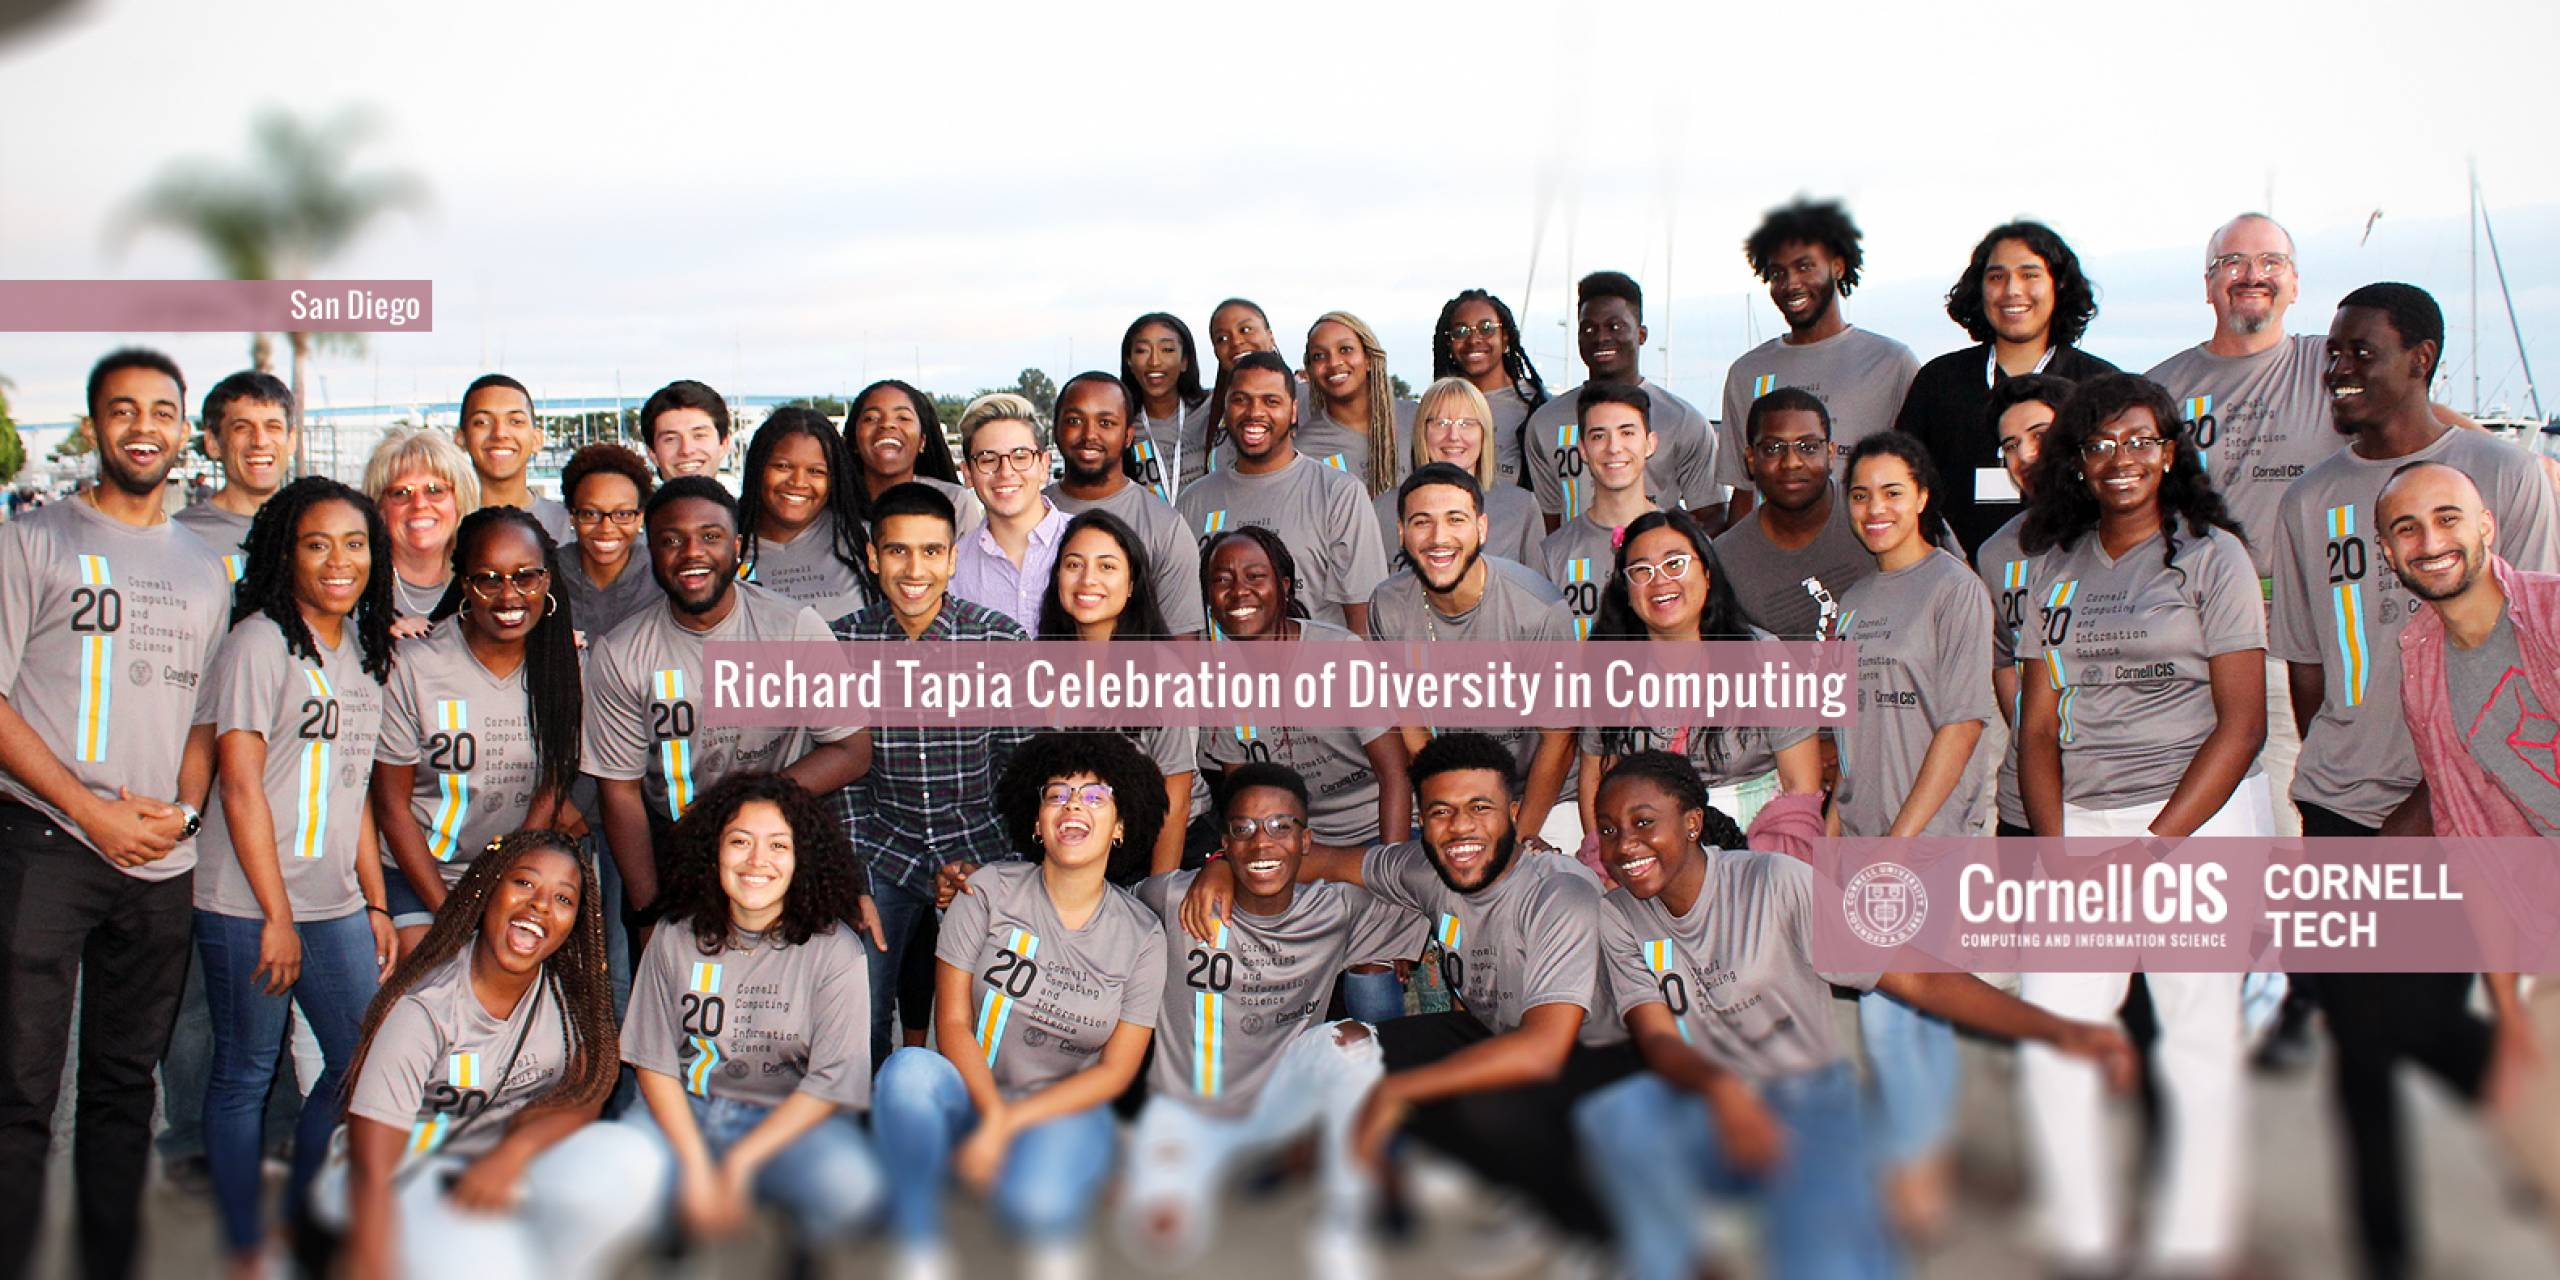 Richard Tapia Celebration of Diversity in Computing